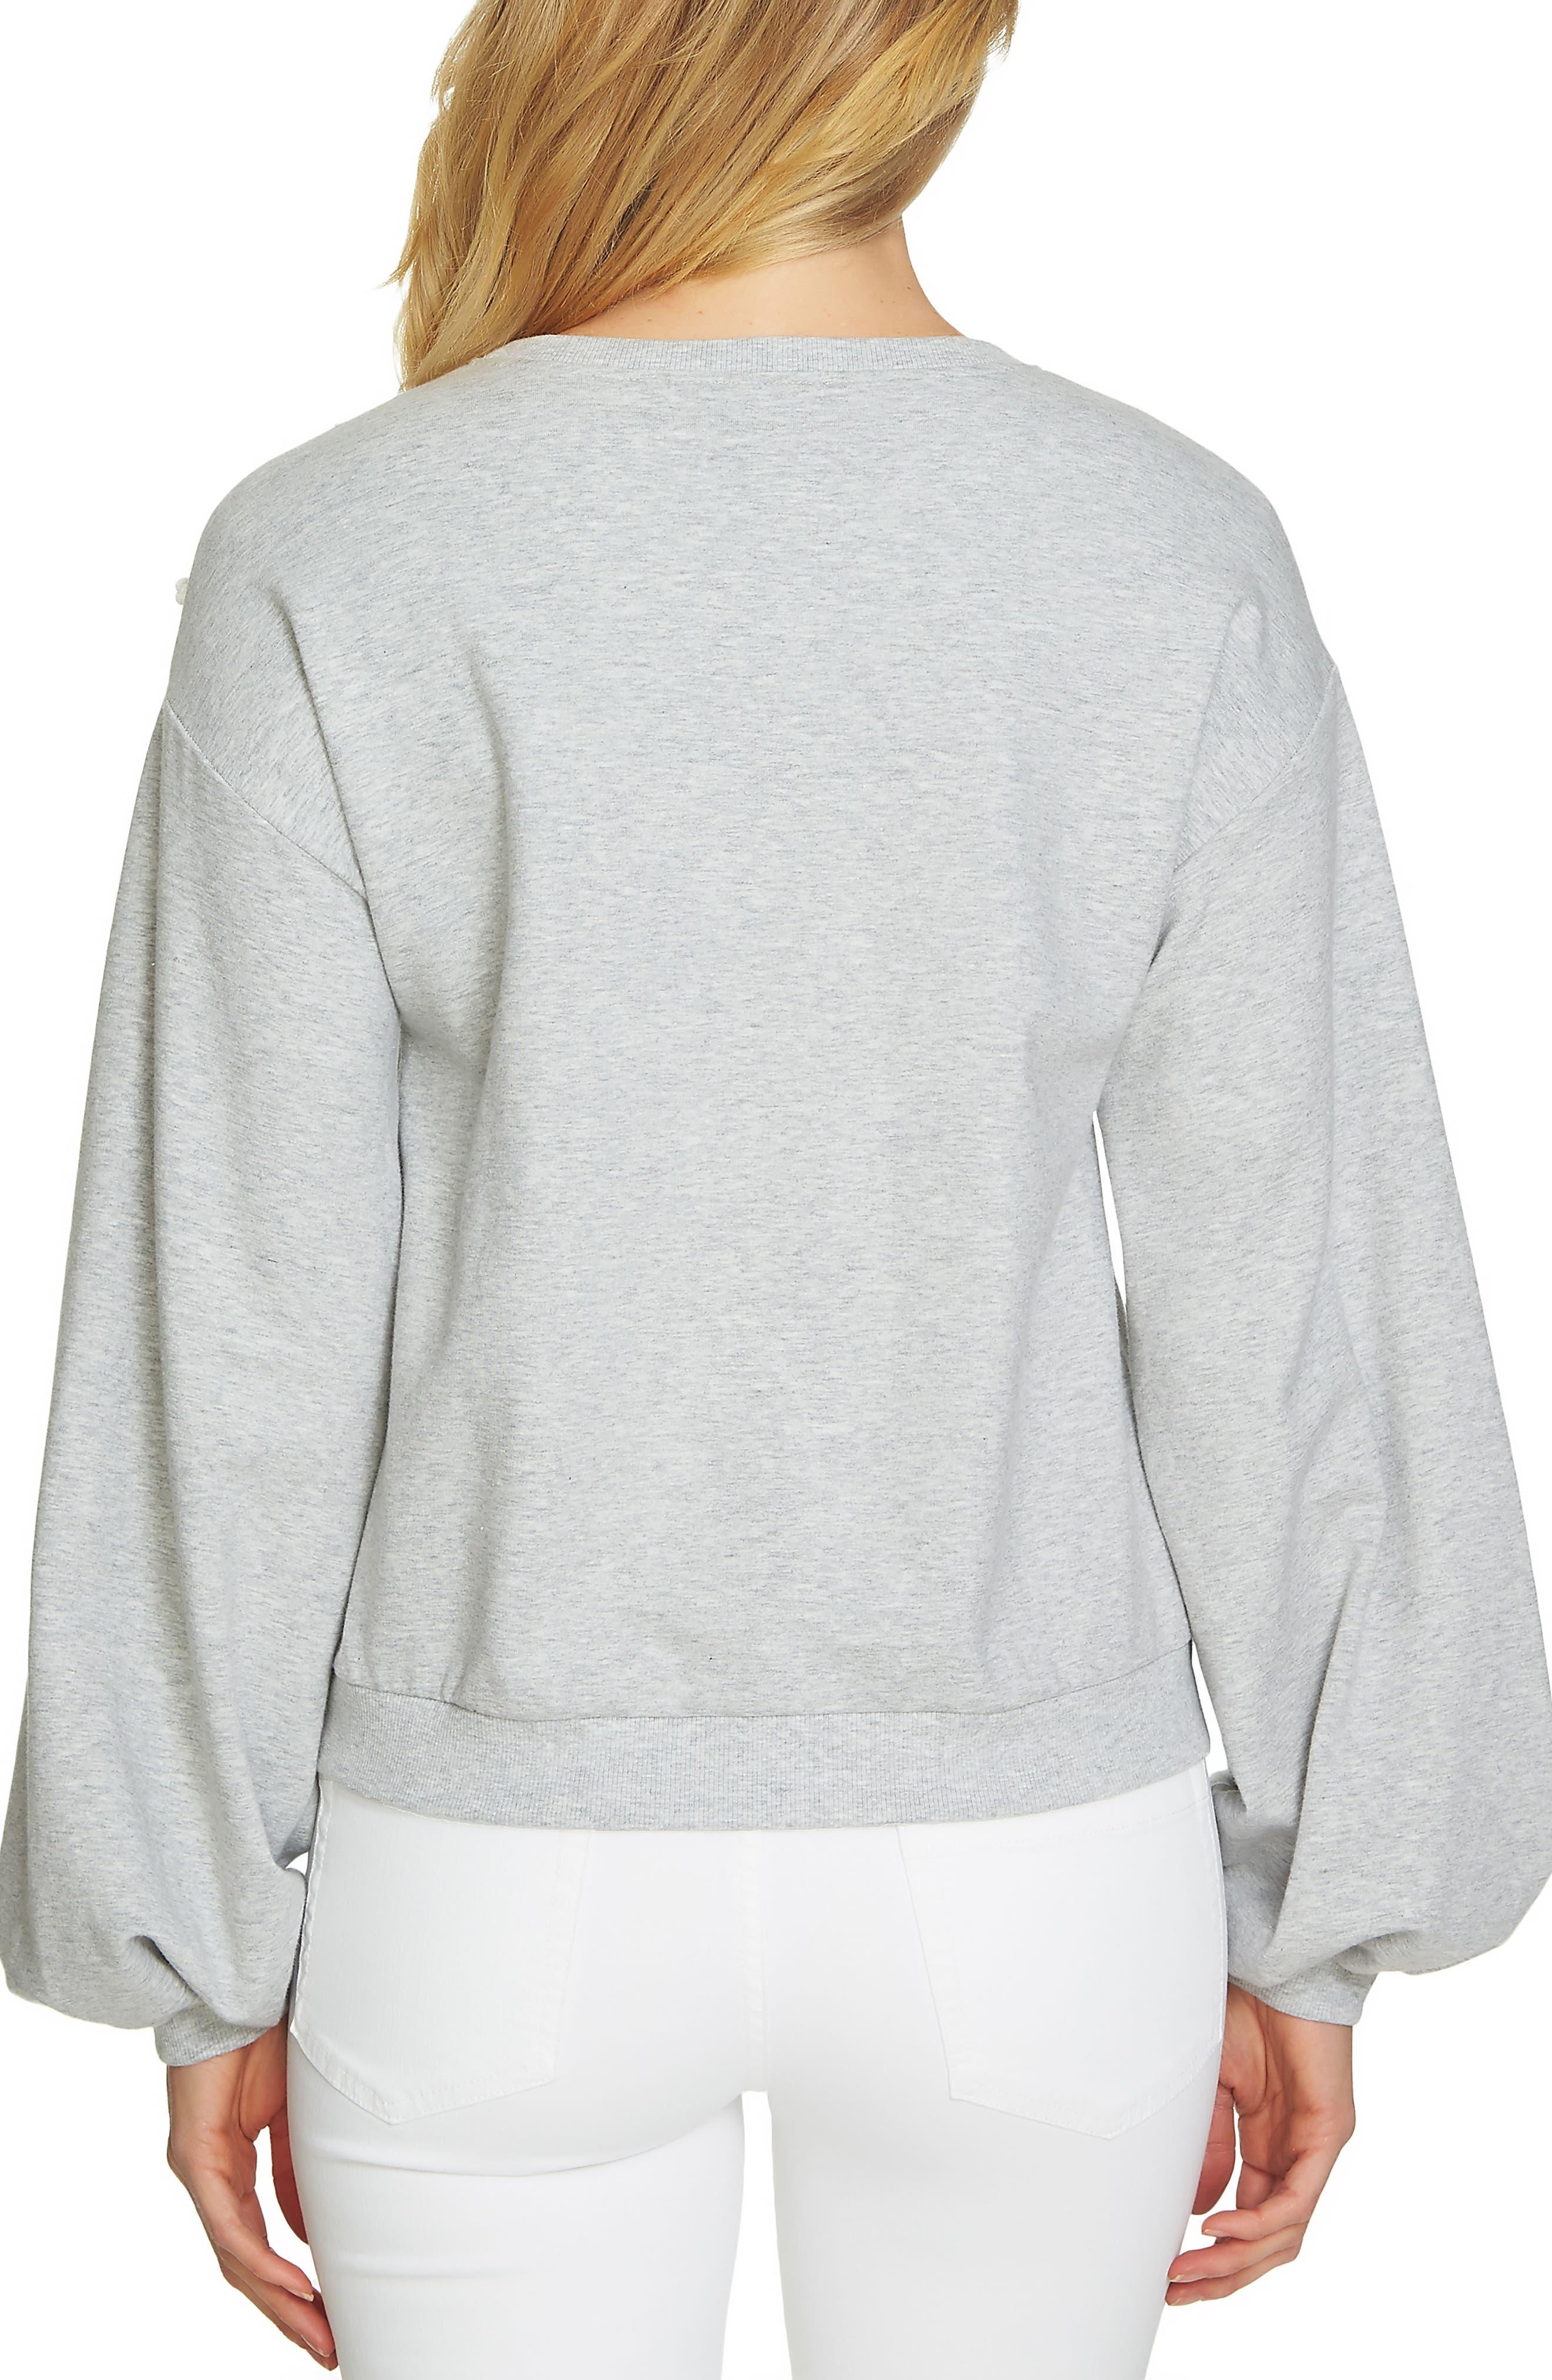 Embellished Sweatshirt,                             Alternate thumbnail 2, color,                             050